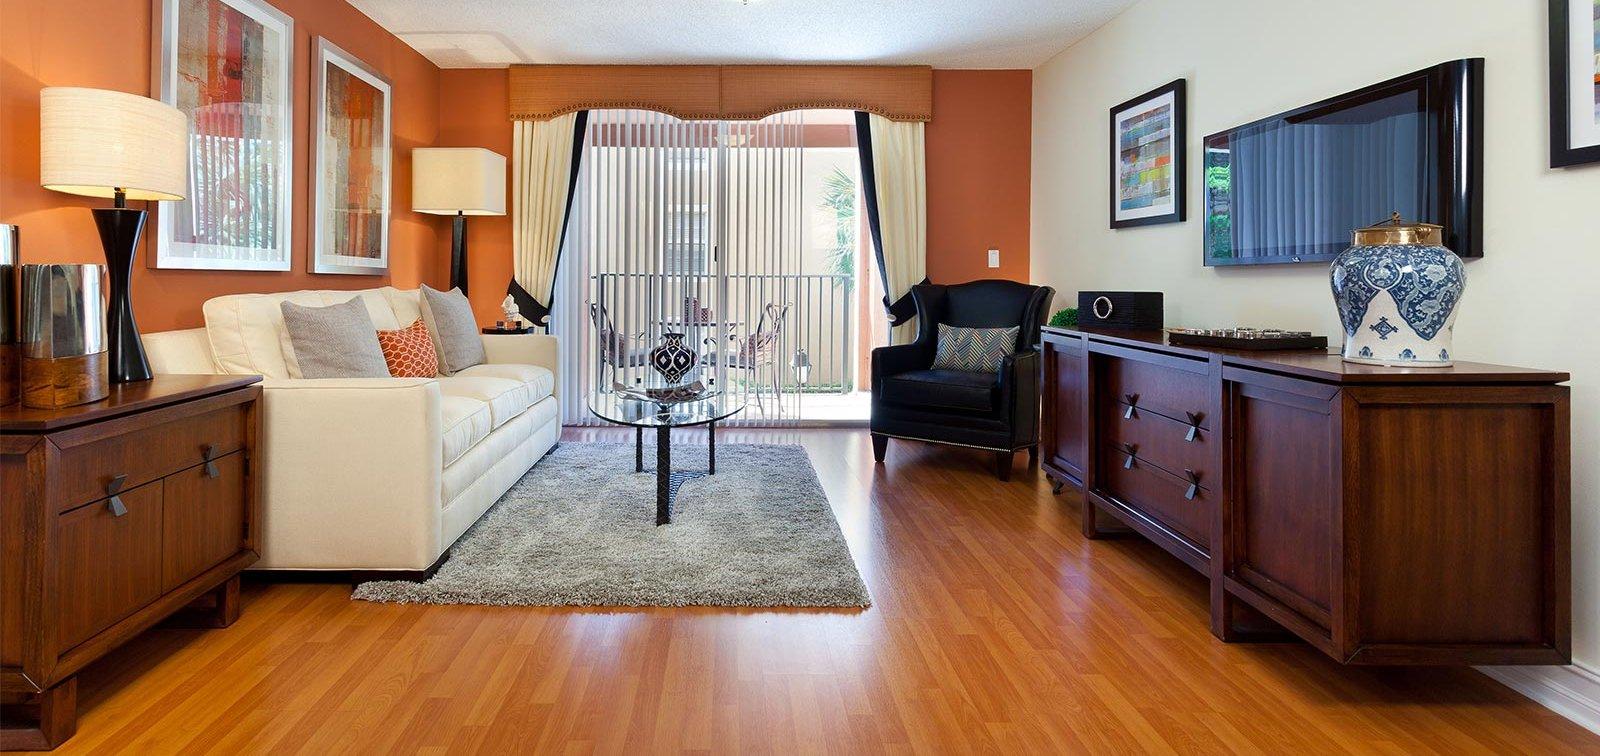 Crescent House Apartments In Miami Lakes Fl